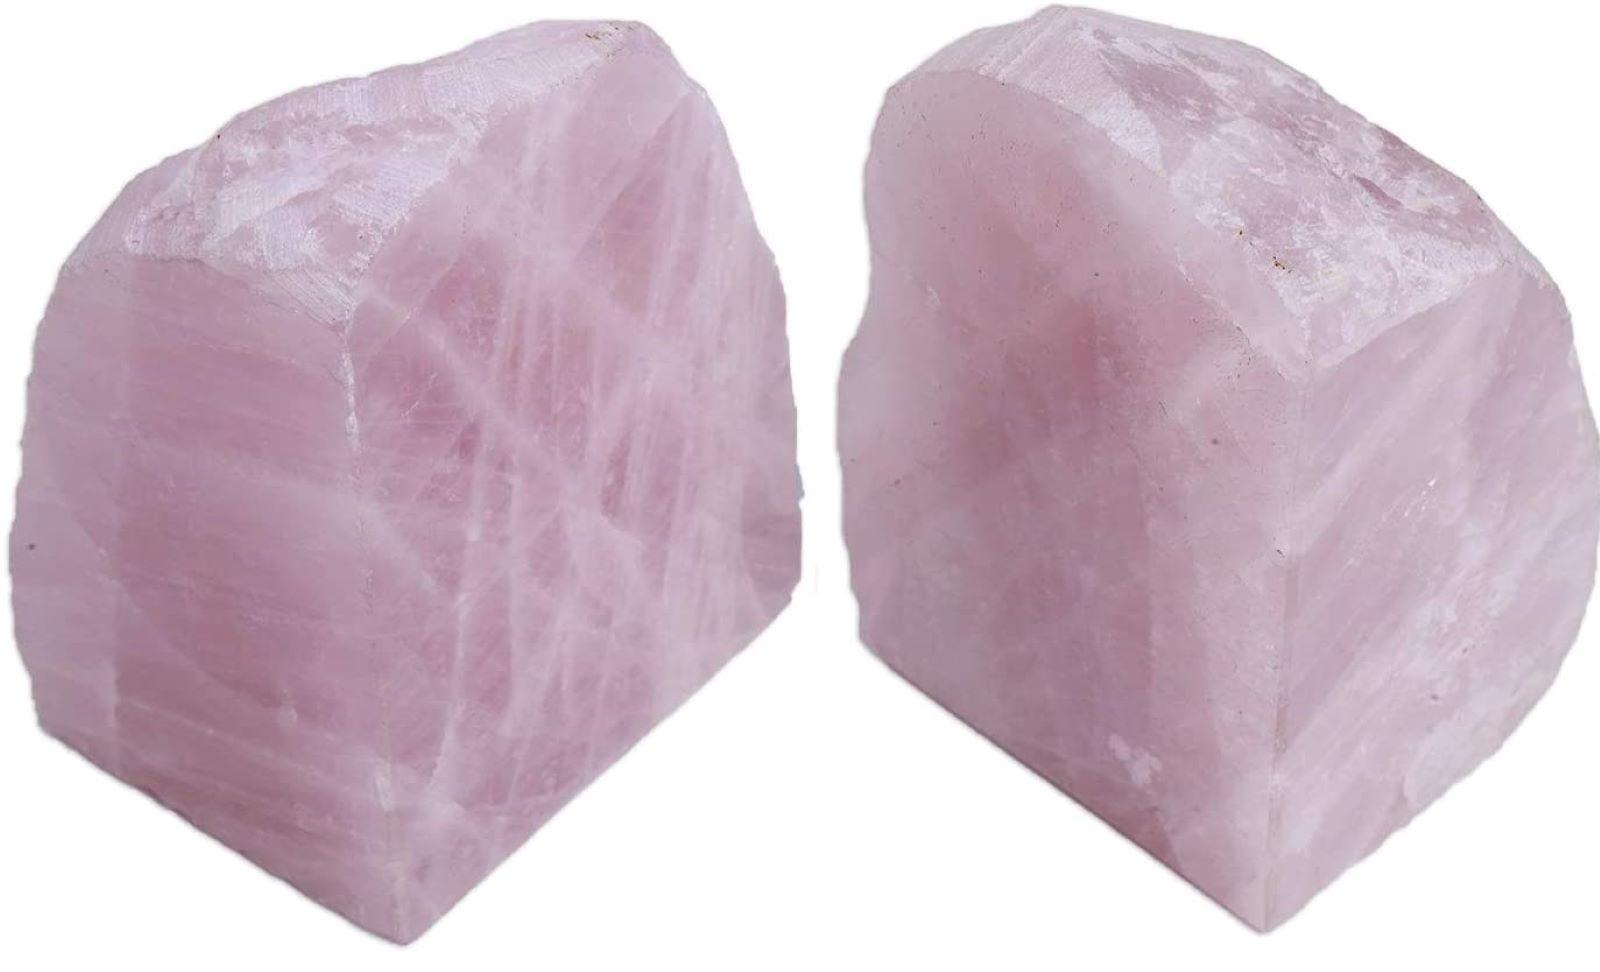 Two rose quartz bookends.